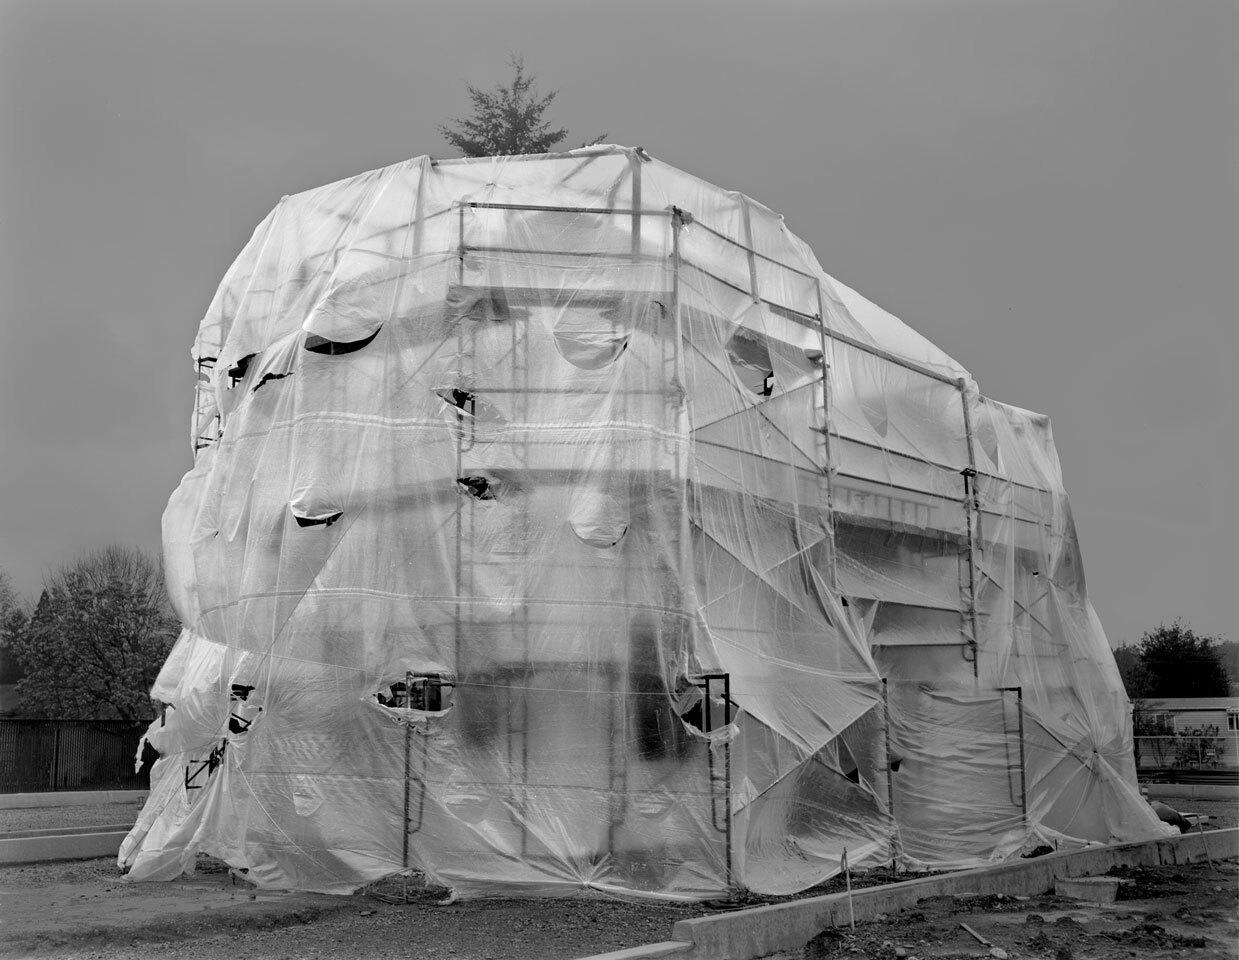 Sheltered on SE 82nd Ave; Portland, Oregon by Loren Nelson